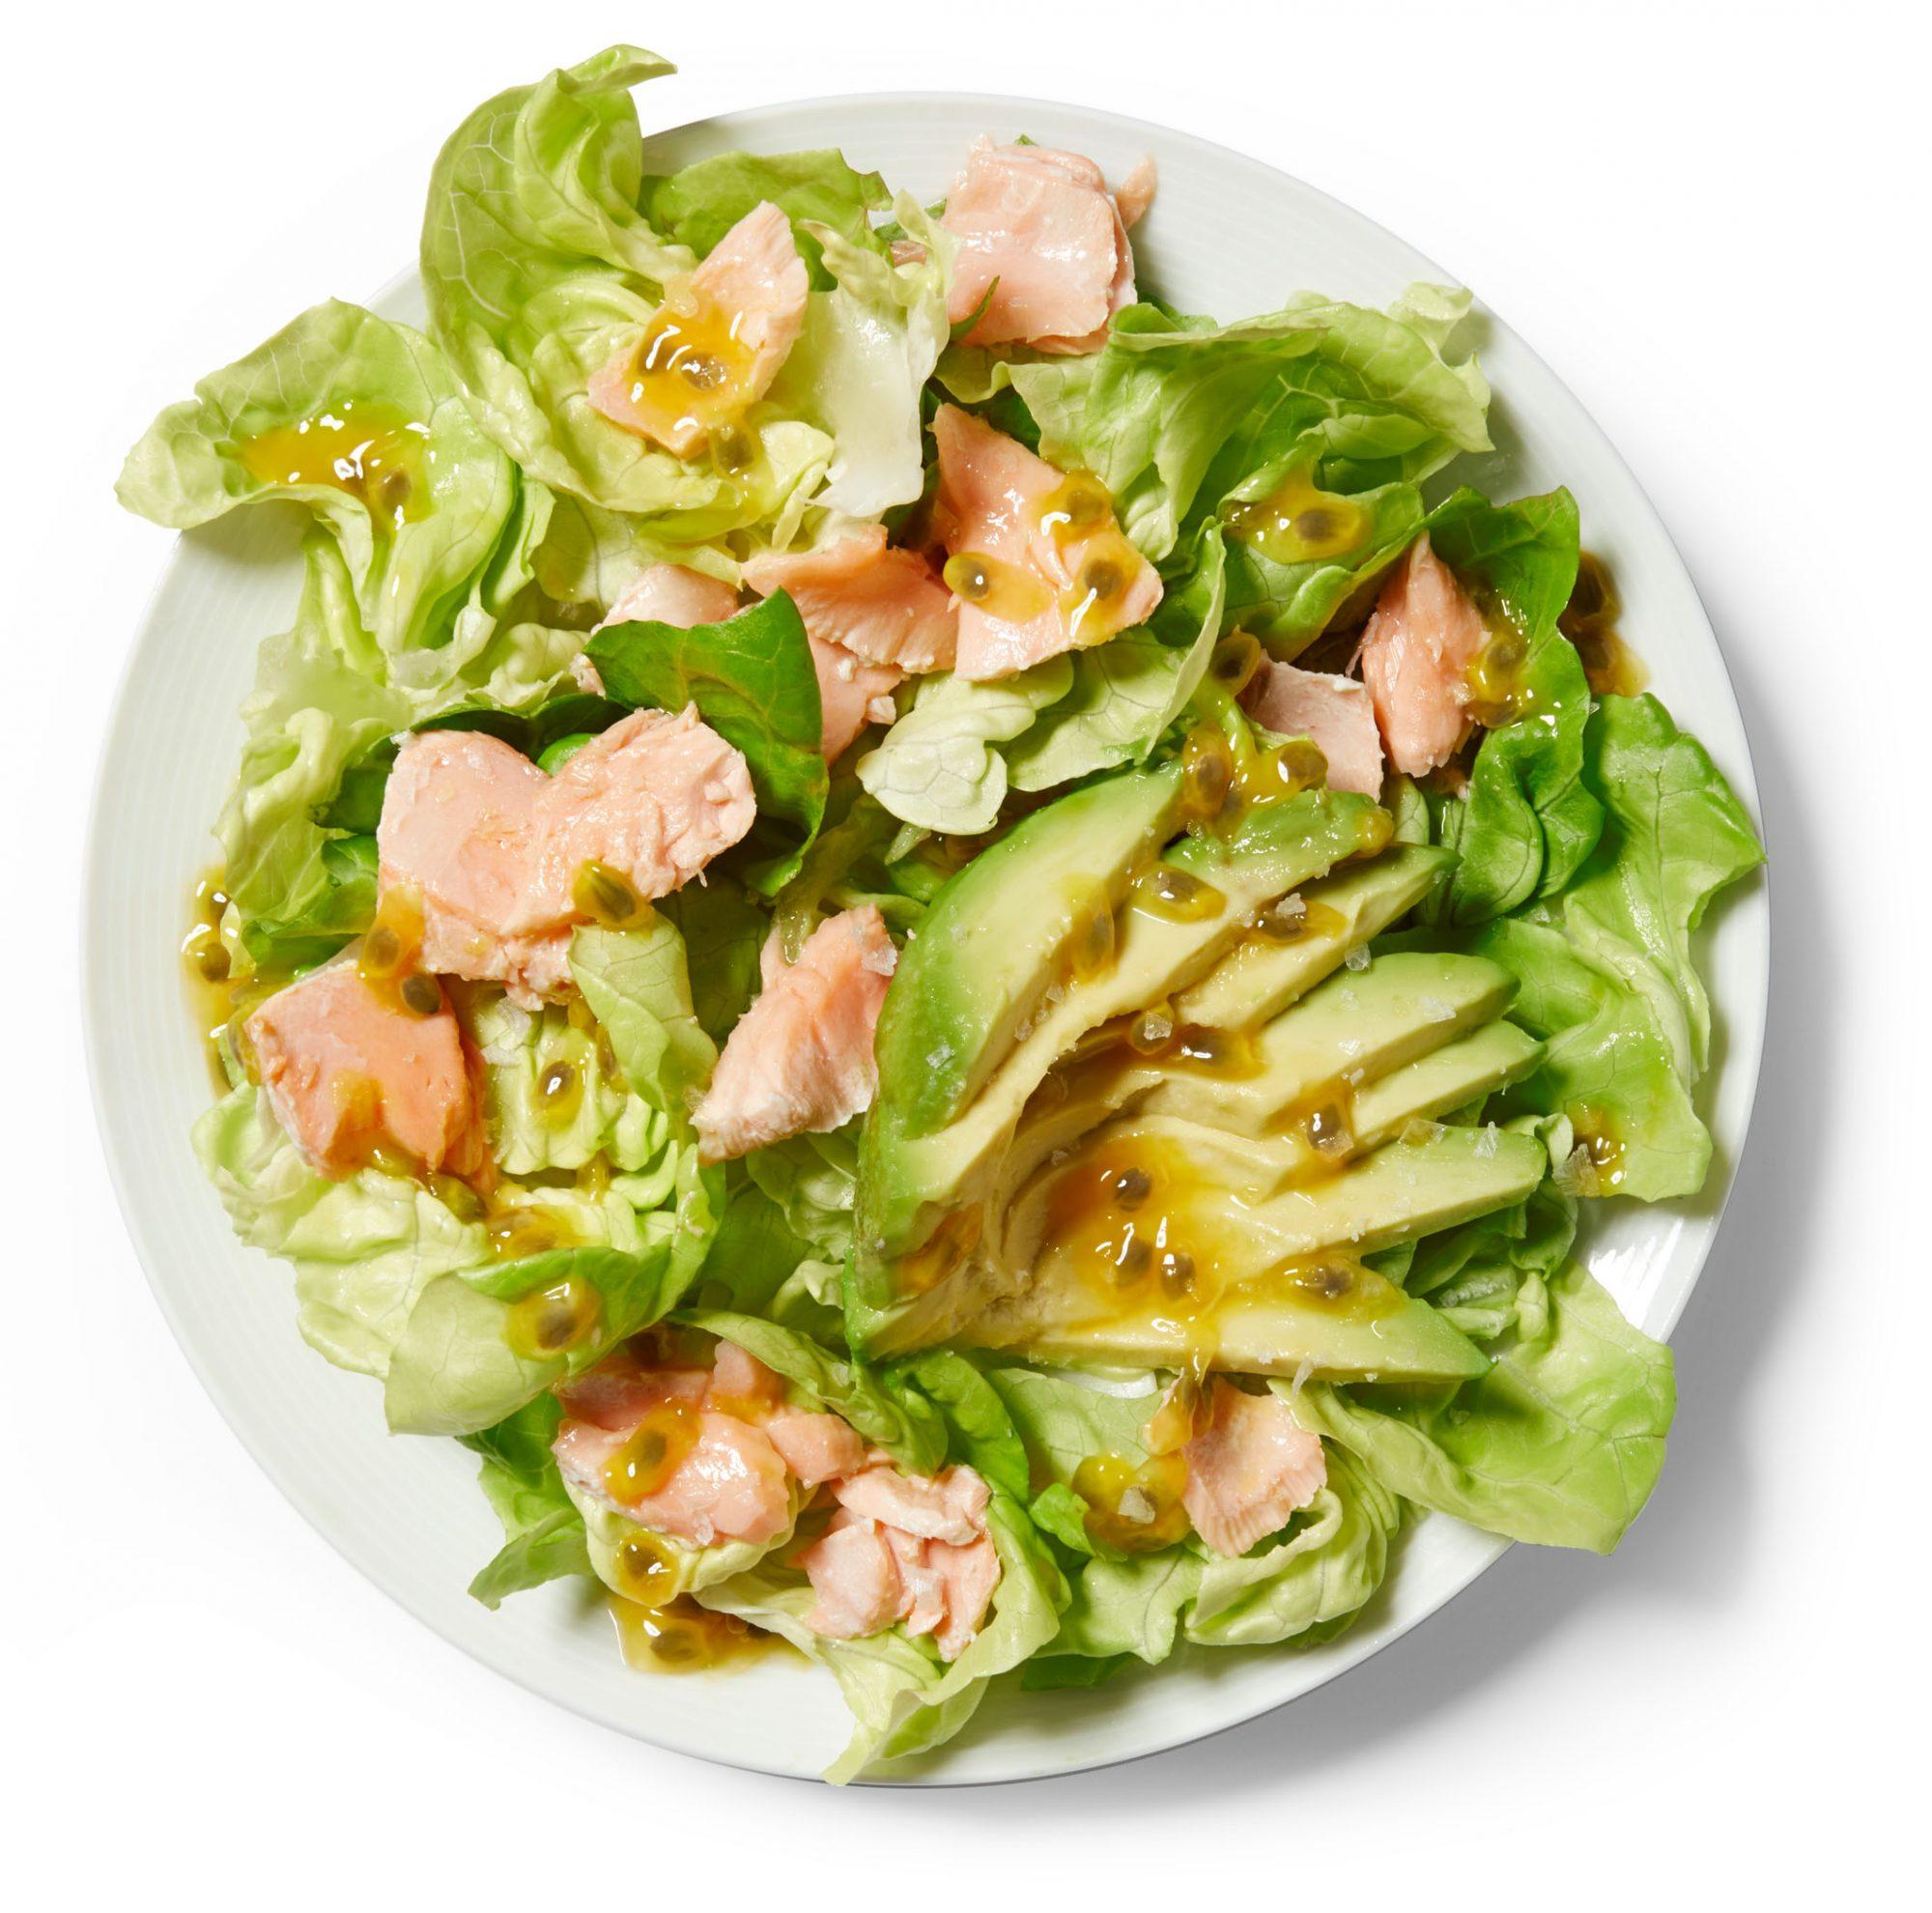 Salmon-Avocado Salad With Passion-Fruit Vinaigrette